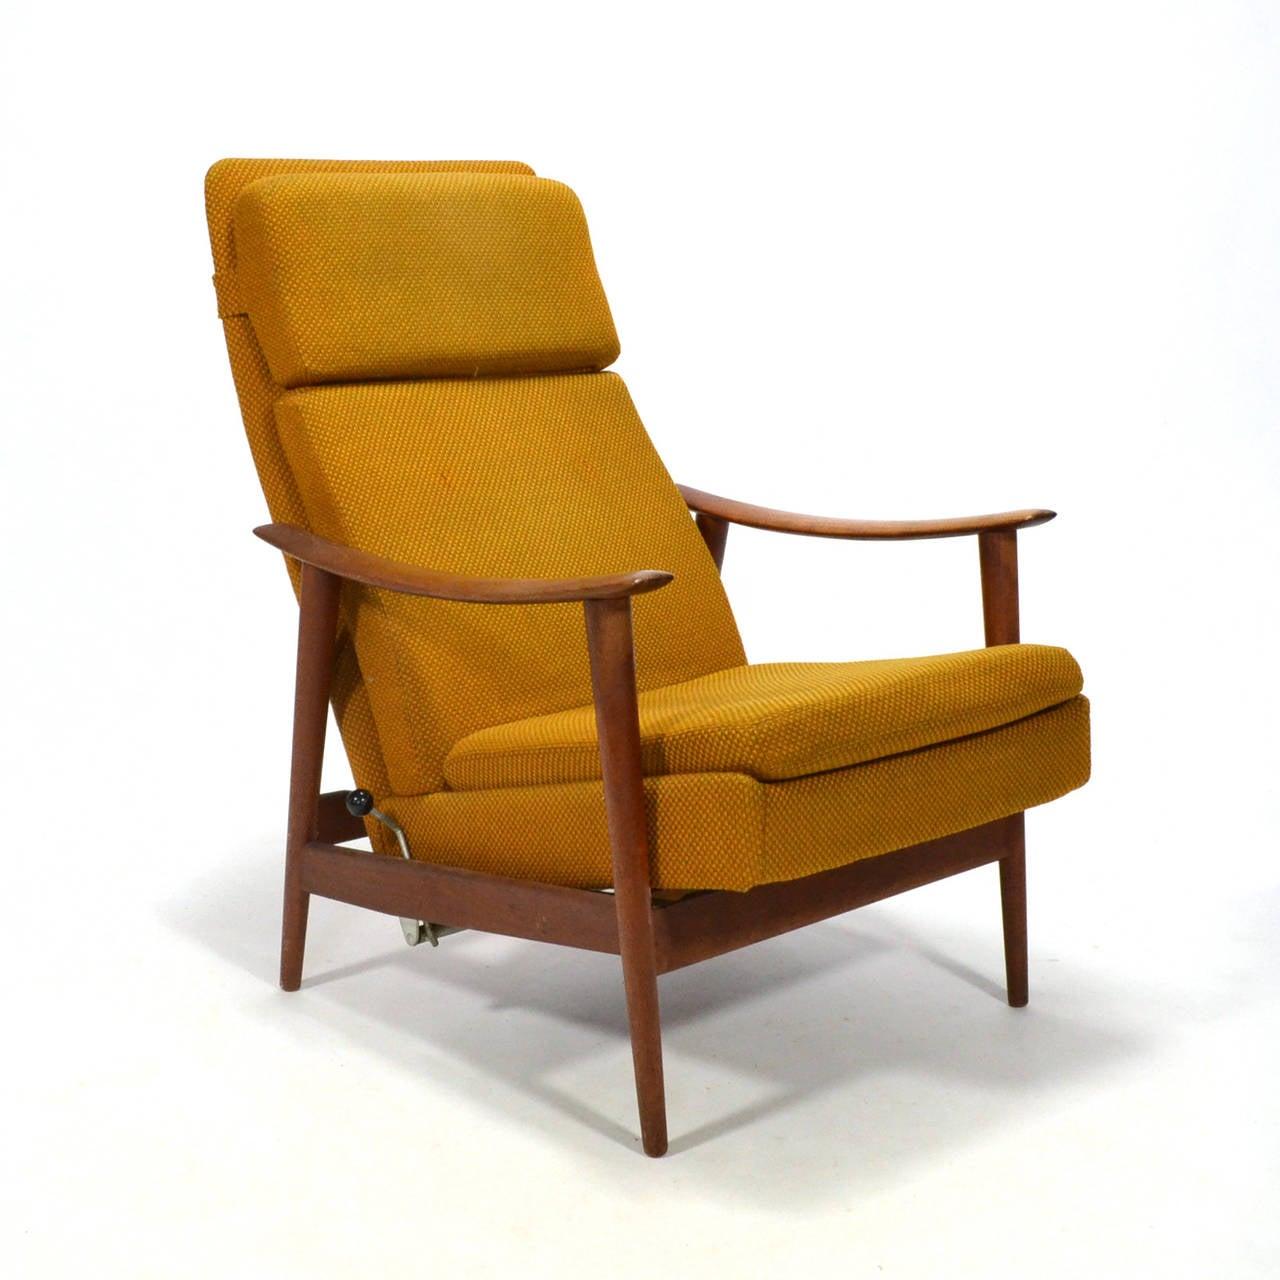 Danish Teak Reclining Lounge Chair 2  sc 1 st  1stDibs & Danish Teak Reclining Lounge Chair at 1stdibs islam-shia.org